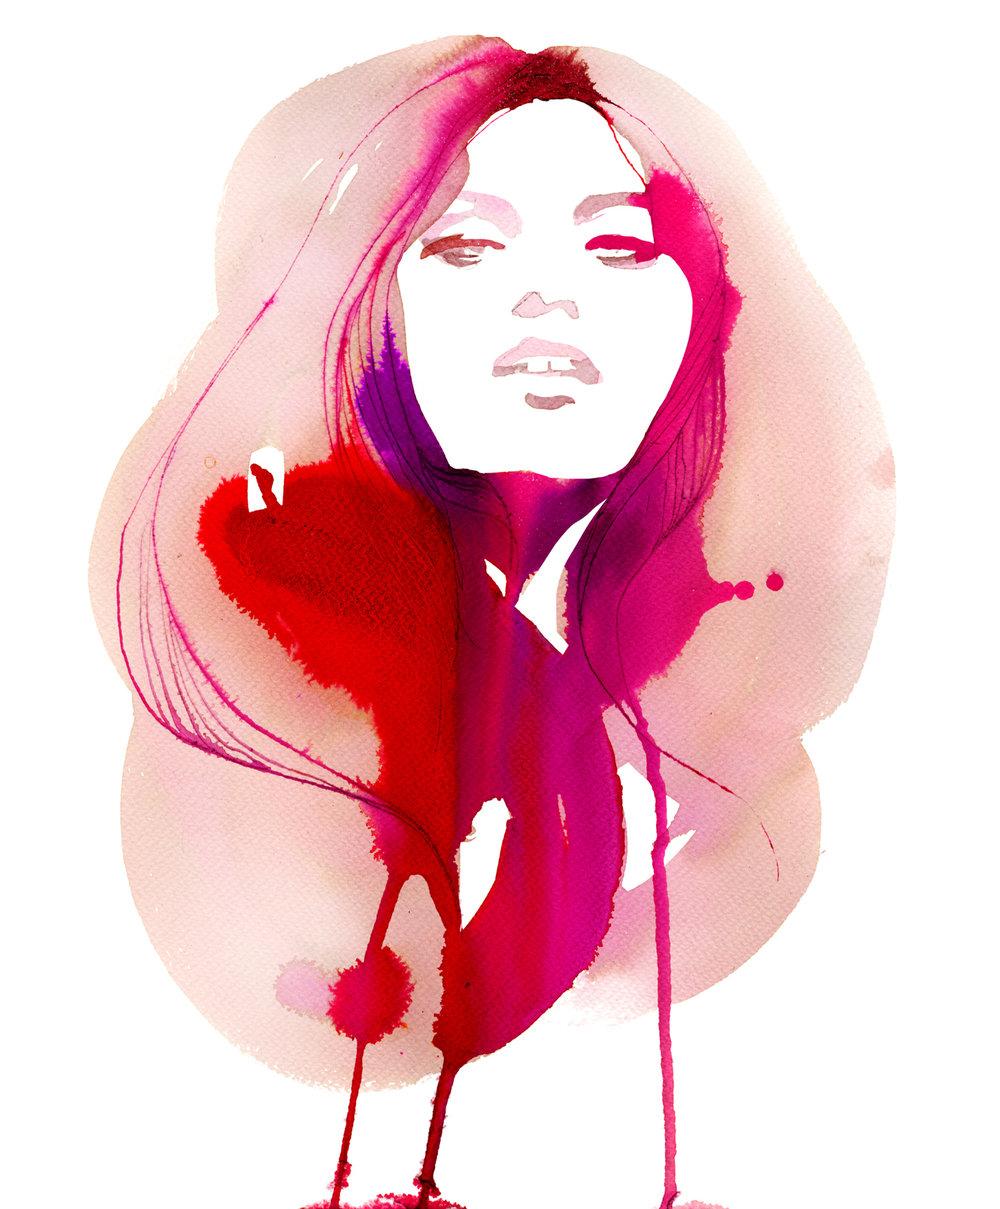 stina-persson-watercolor-le-kid copy.jpg